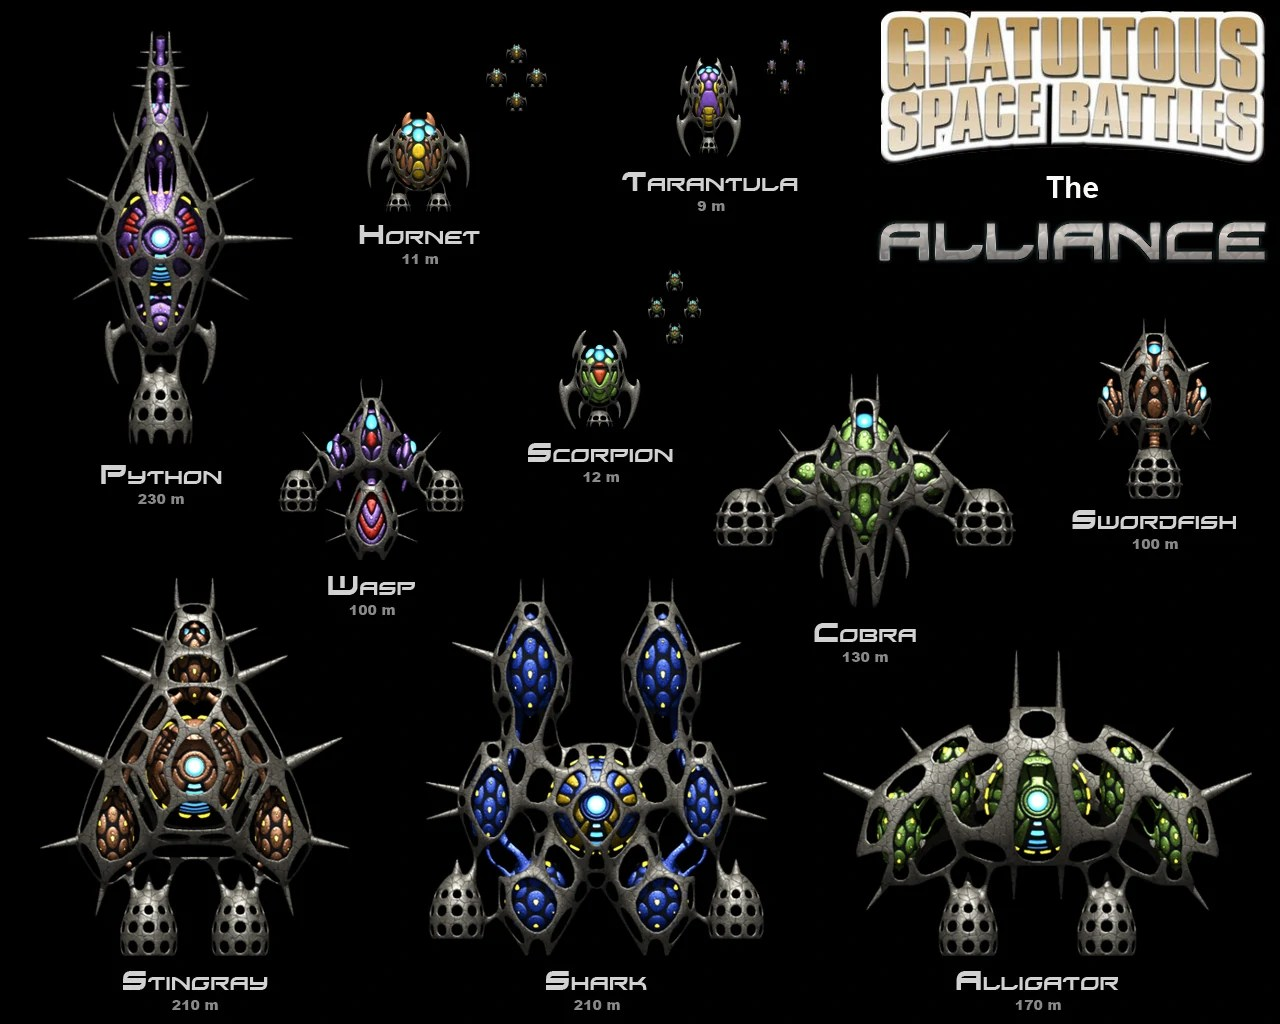 3d Galactic Wallpaper Alliance Gratuitous Space Battles Wiki Fandom Powered